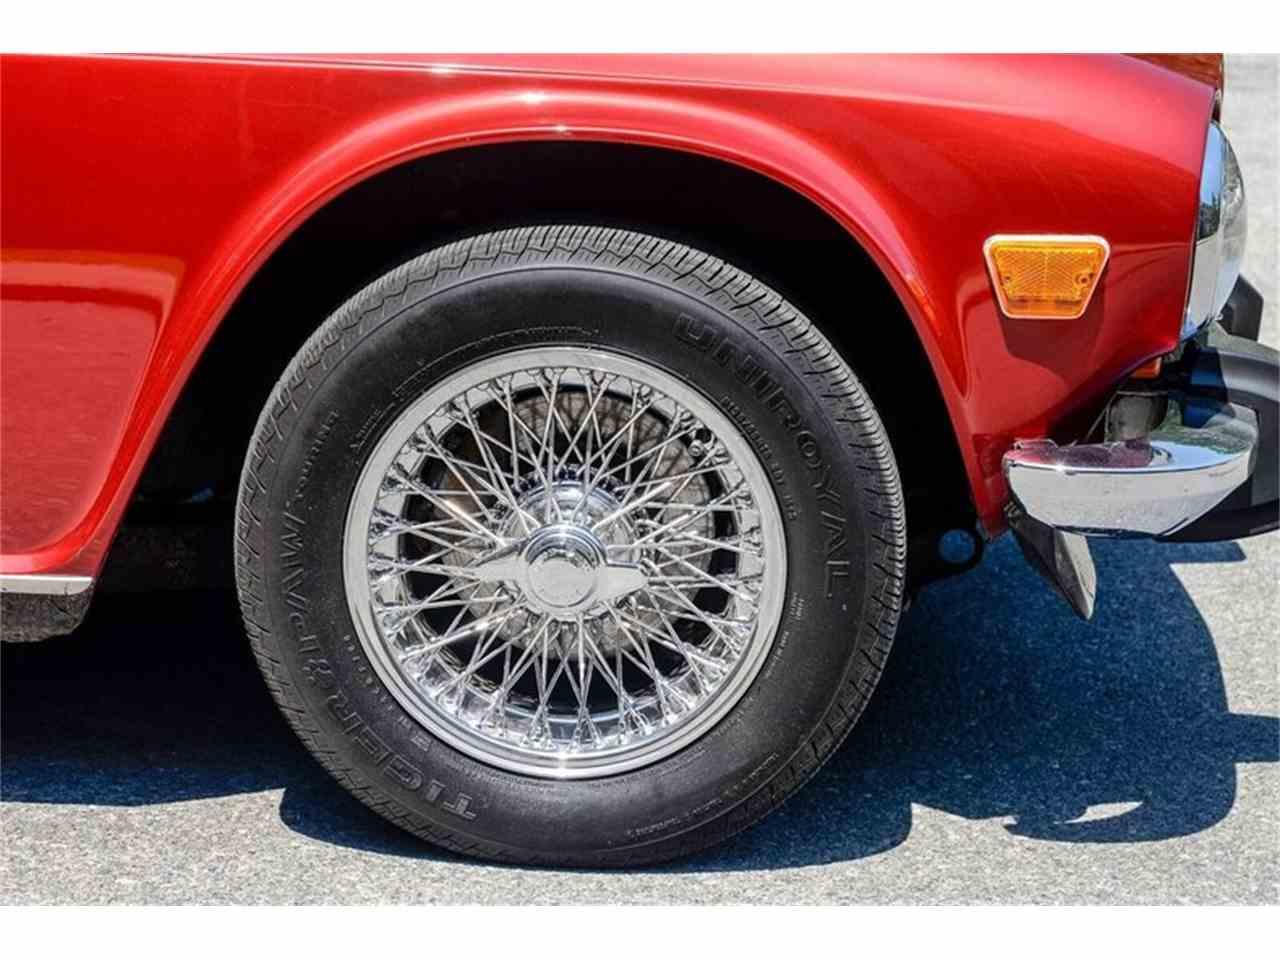 1974 Triumph TR6 for Sale | ClassicCars.com | CC-995343